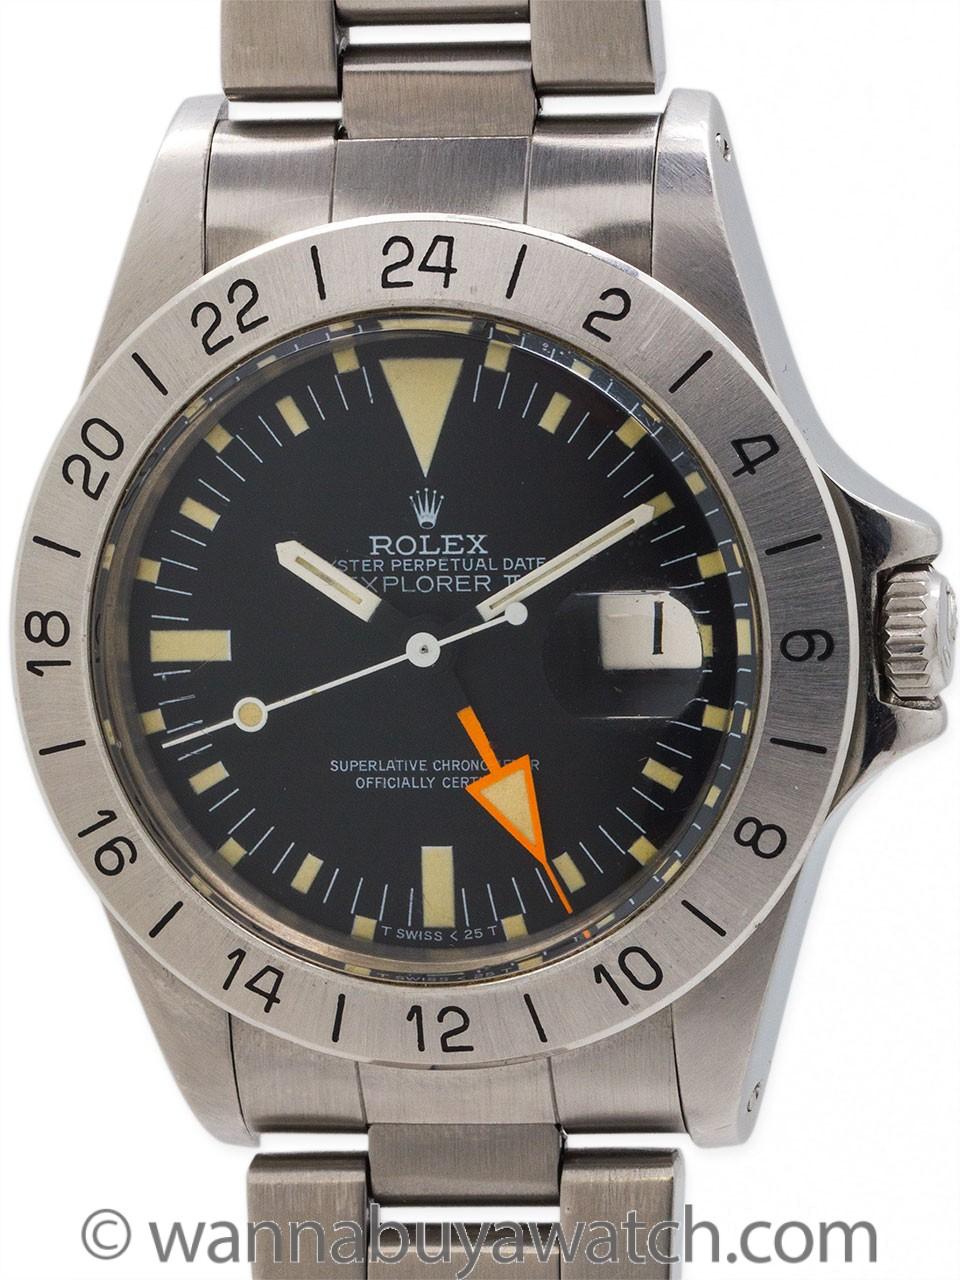 "Rolex Explorer II ref 1655 ""Steve McQueen"" circa 1982"